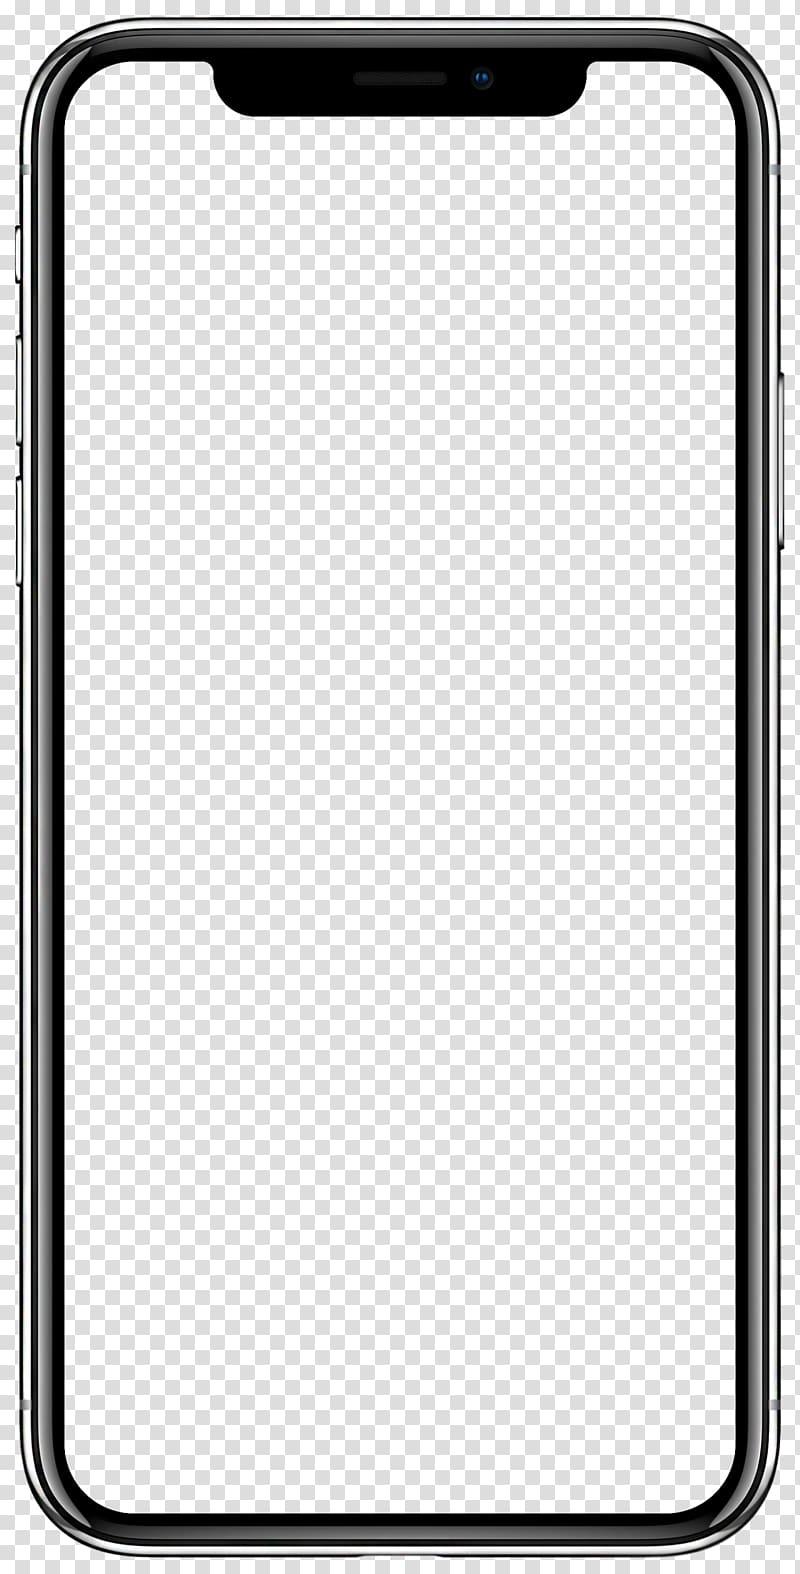 IPhone frame illustration, iPhone X App Store Apple iOS 11, apple.